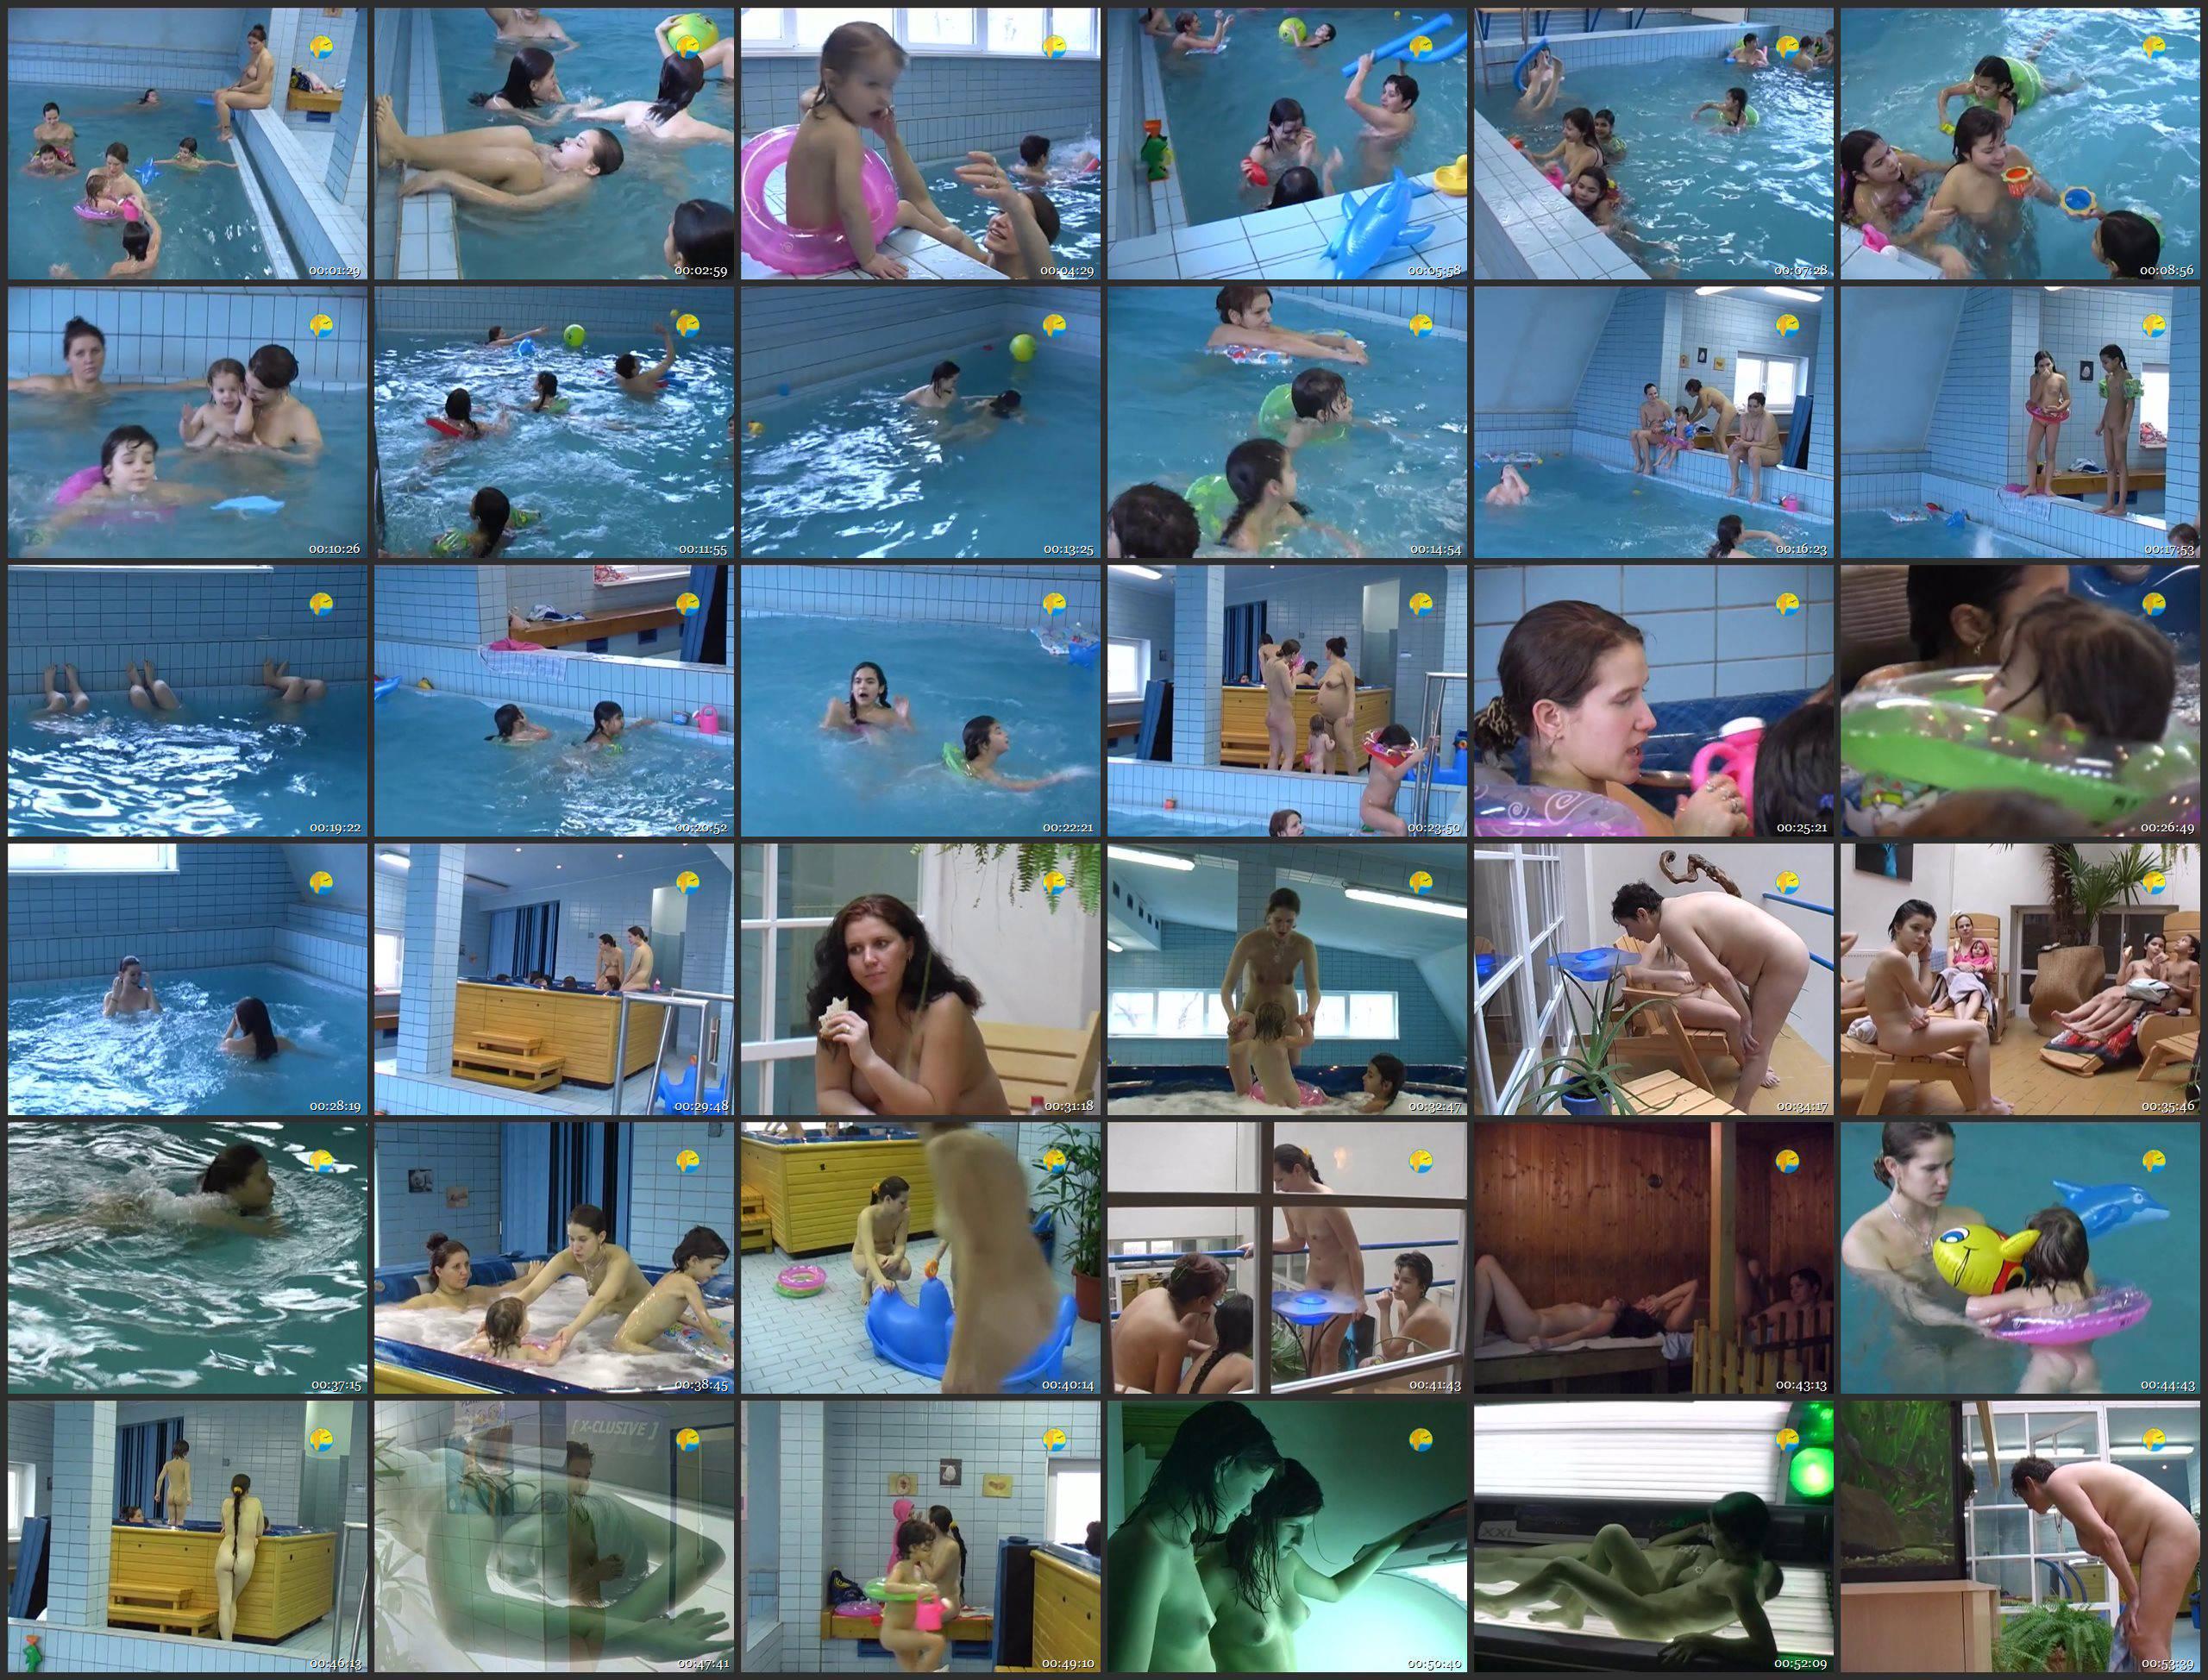 Naturist Freedom Videos Weekend Spa - Thumbnails